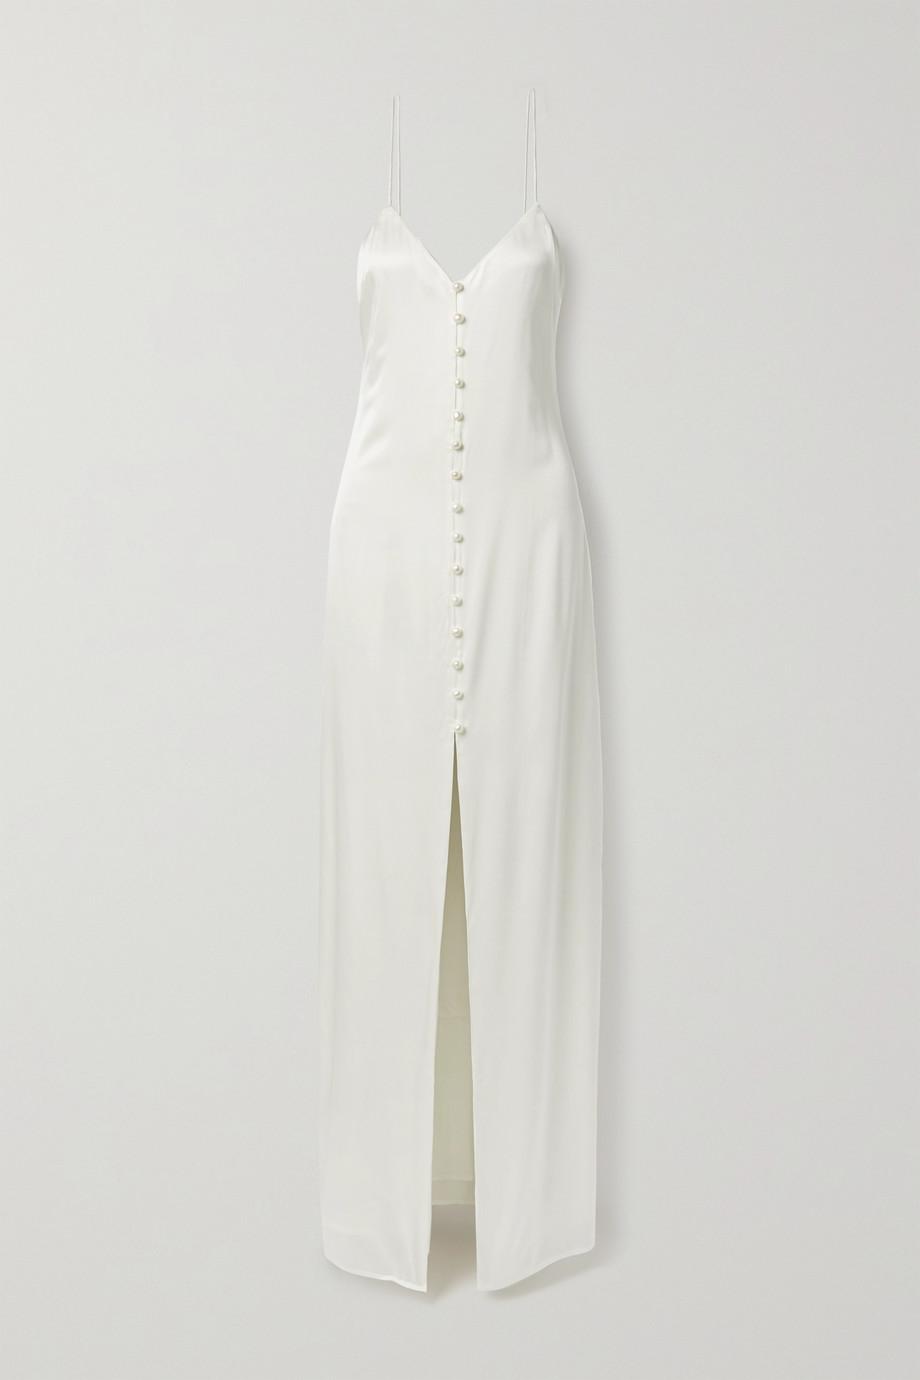 Cami NYC Robe du soir en charmeuse de soie mélangée à perles The Aaliyah